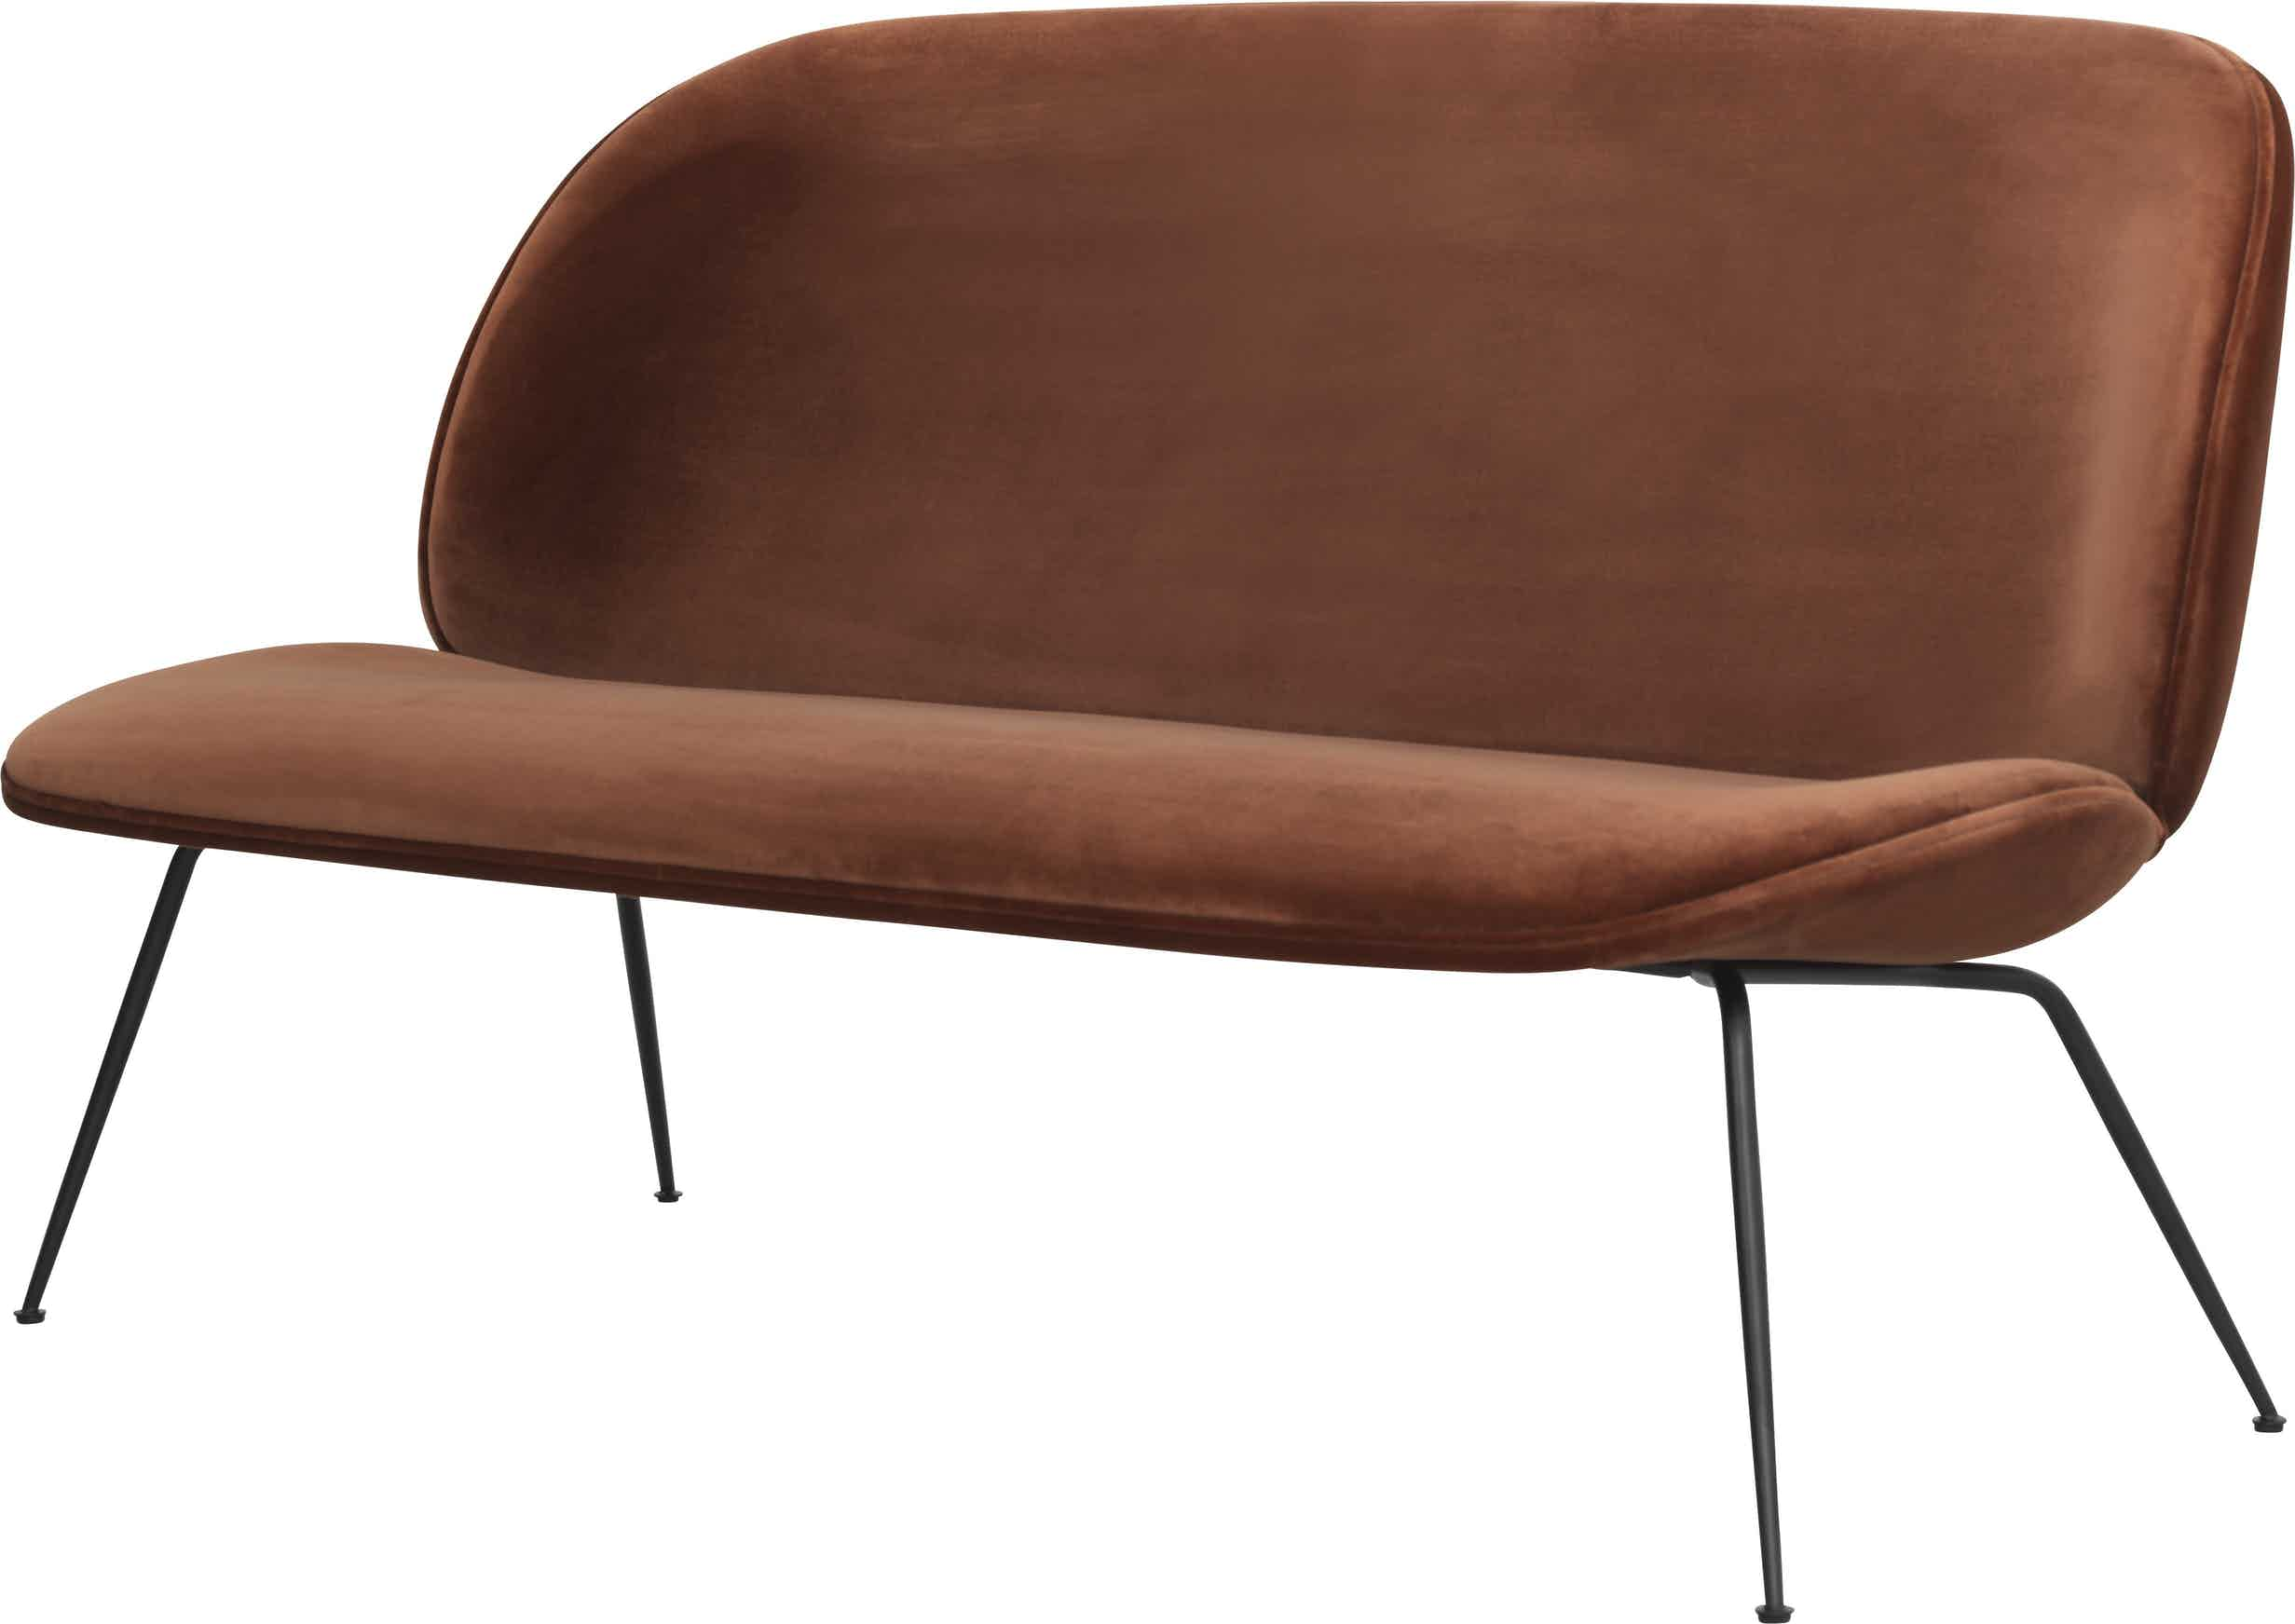 Gubi Beetle Sofa Red Angle Haute Living